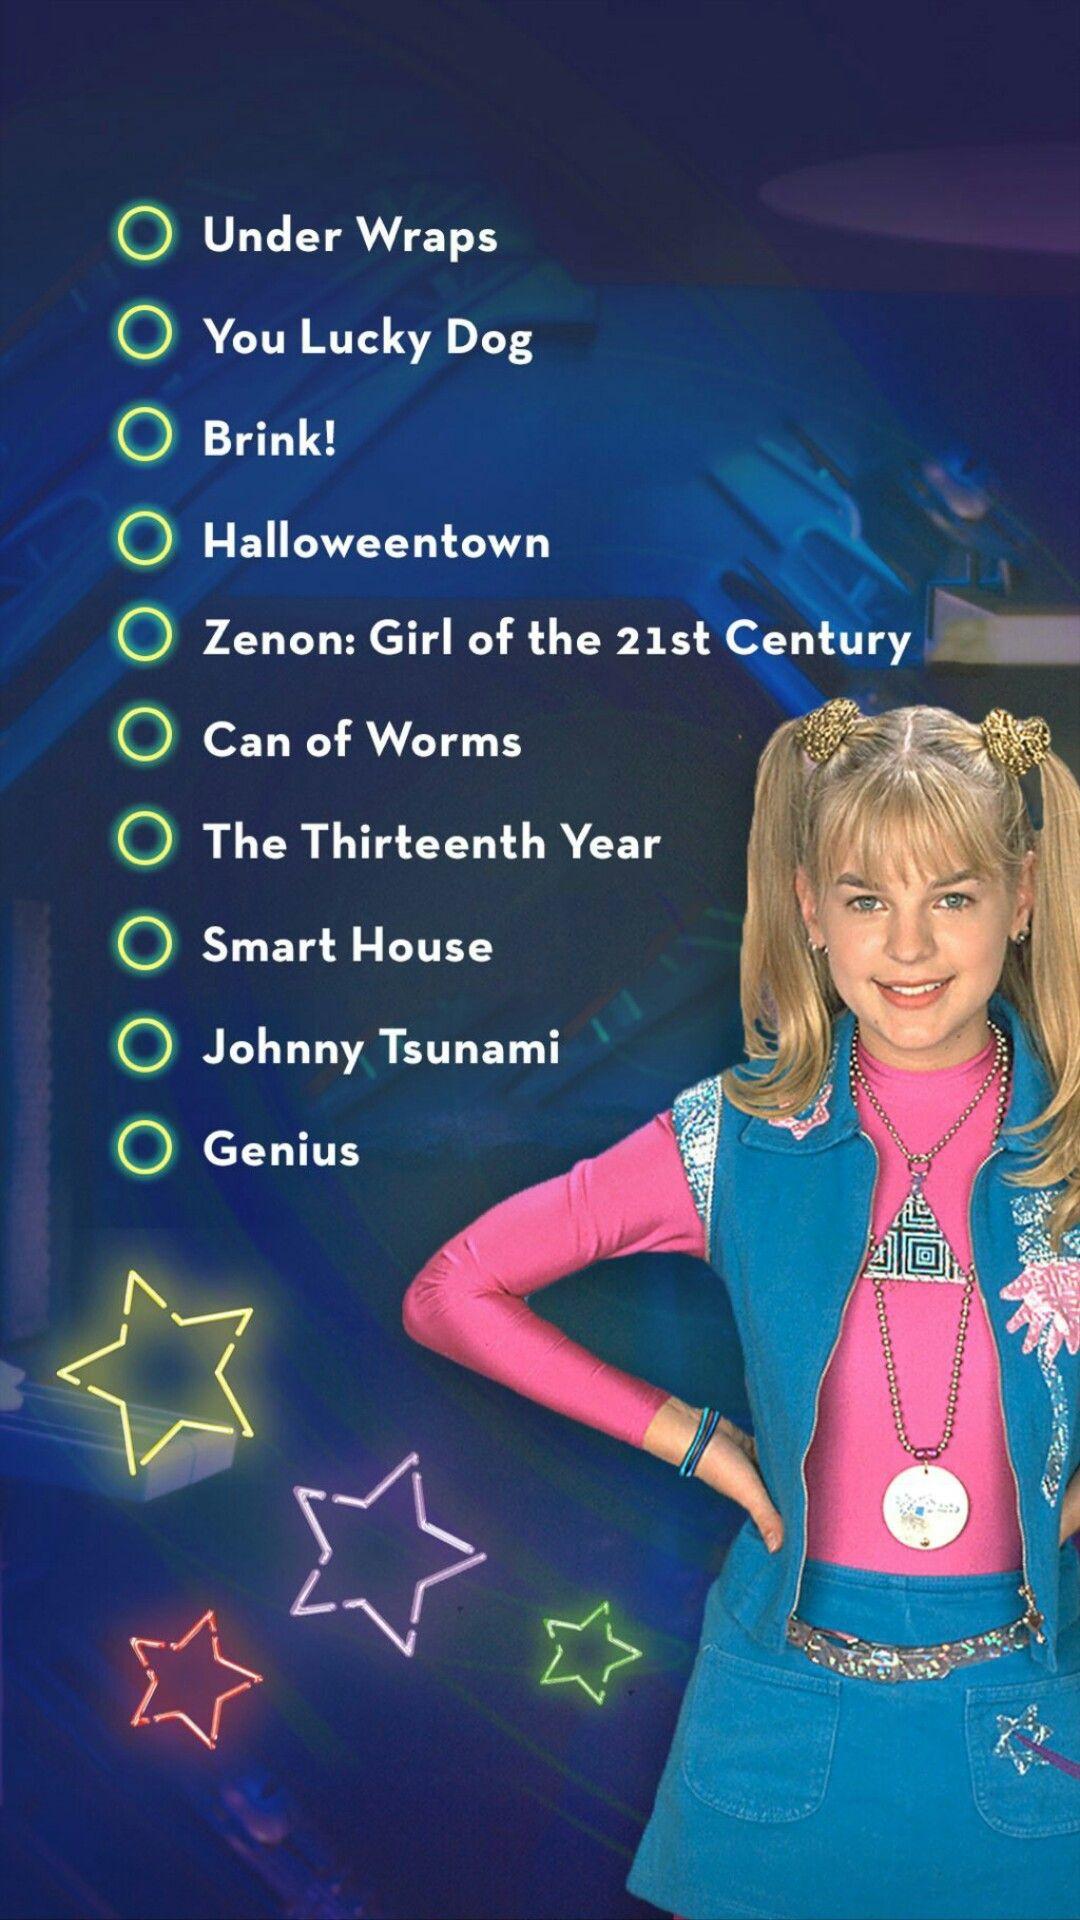 Pin de Disney Lovers! em Disney Channel Original Movies